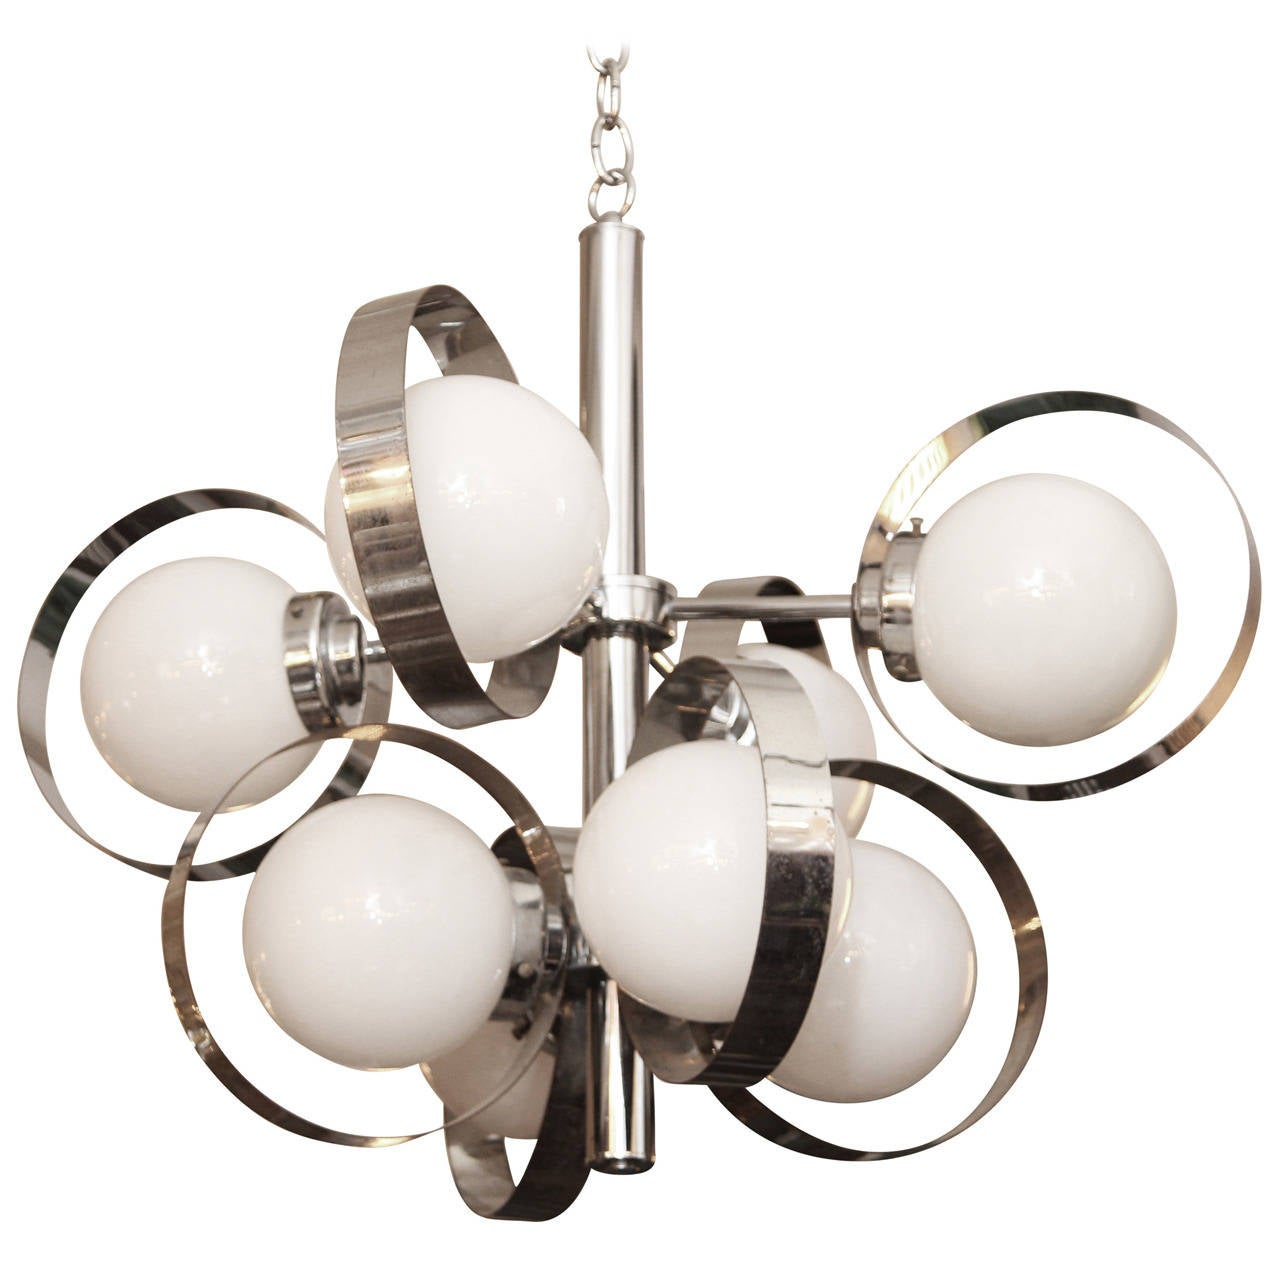 1960s Italian Mid-Century Modern Chrome and Glass Eight-Light Pendant